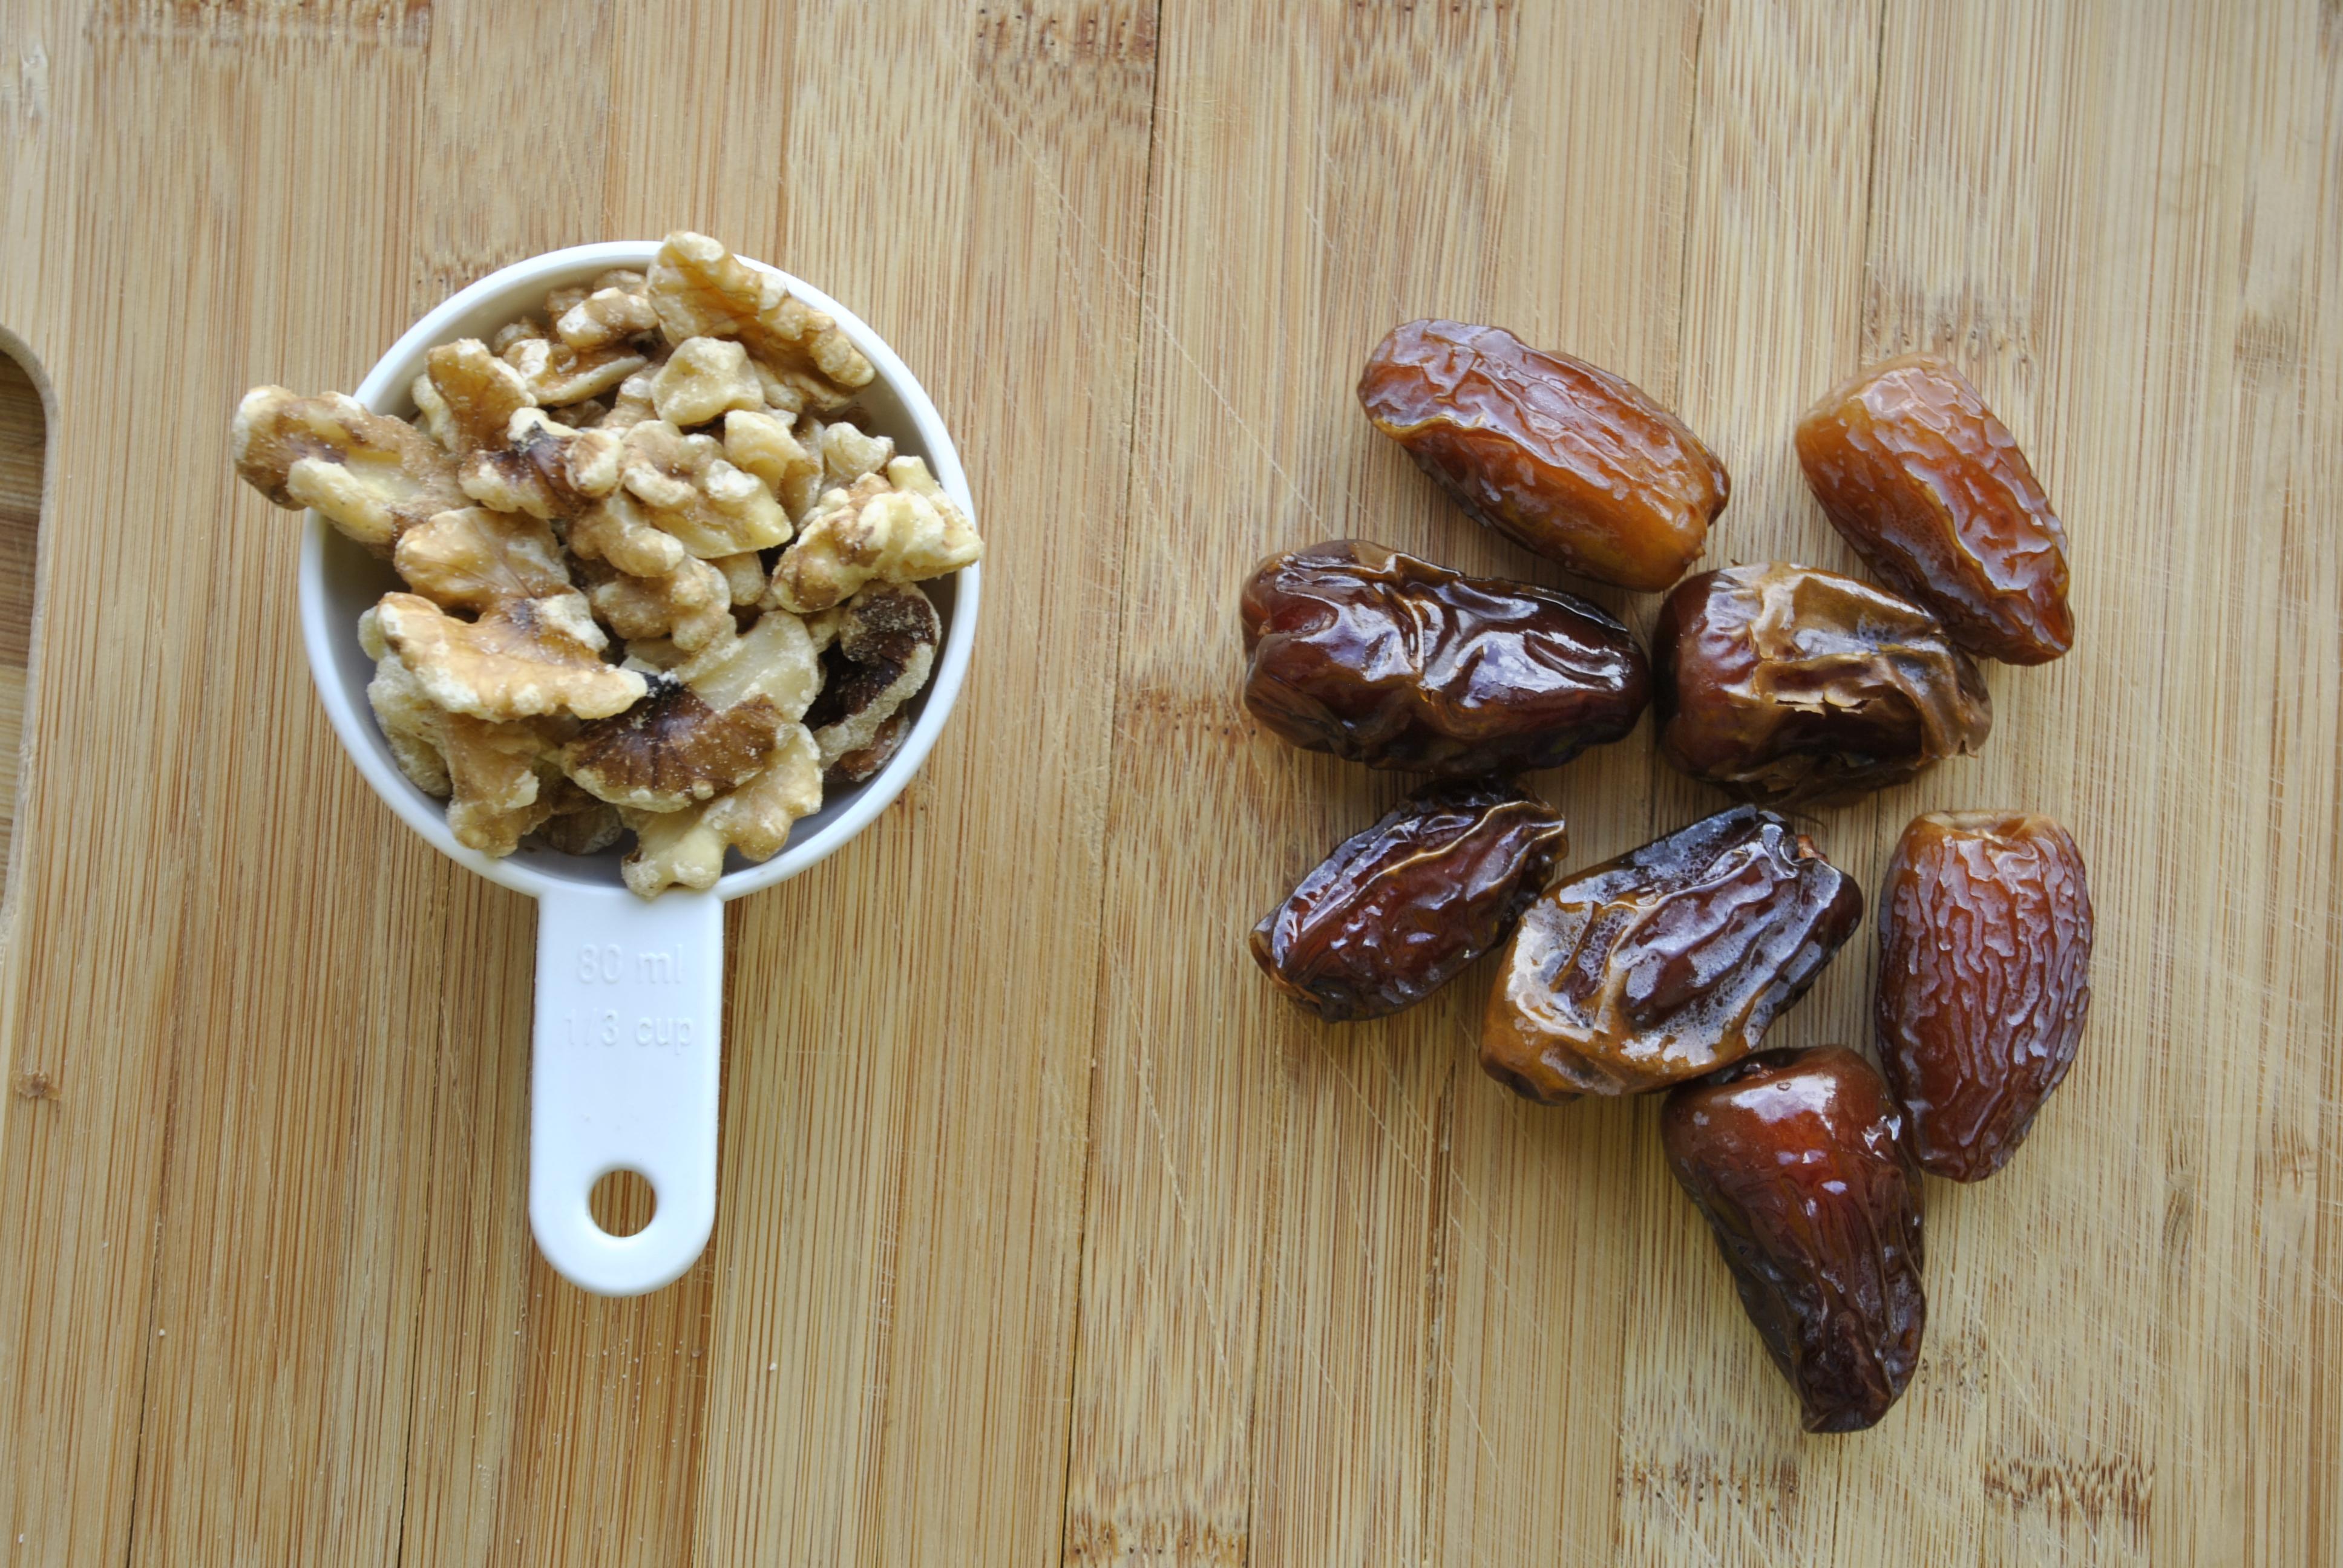 Walnuts and Dates